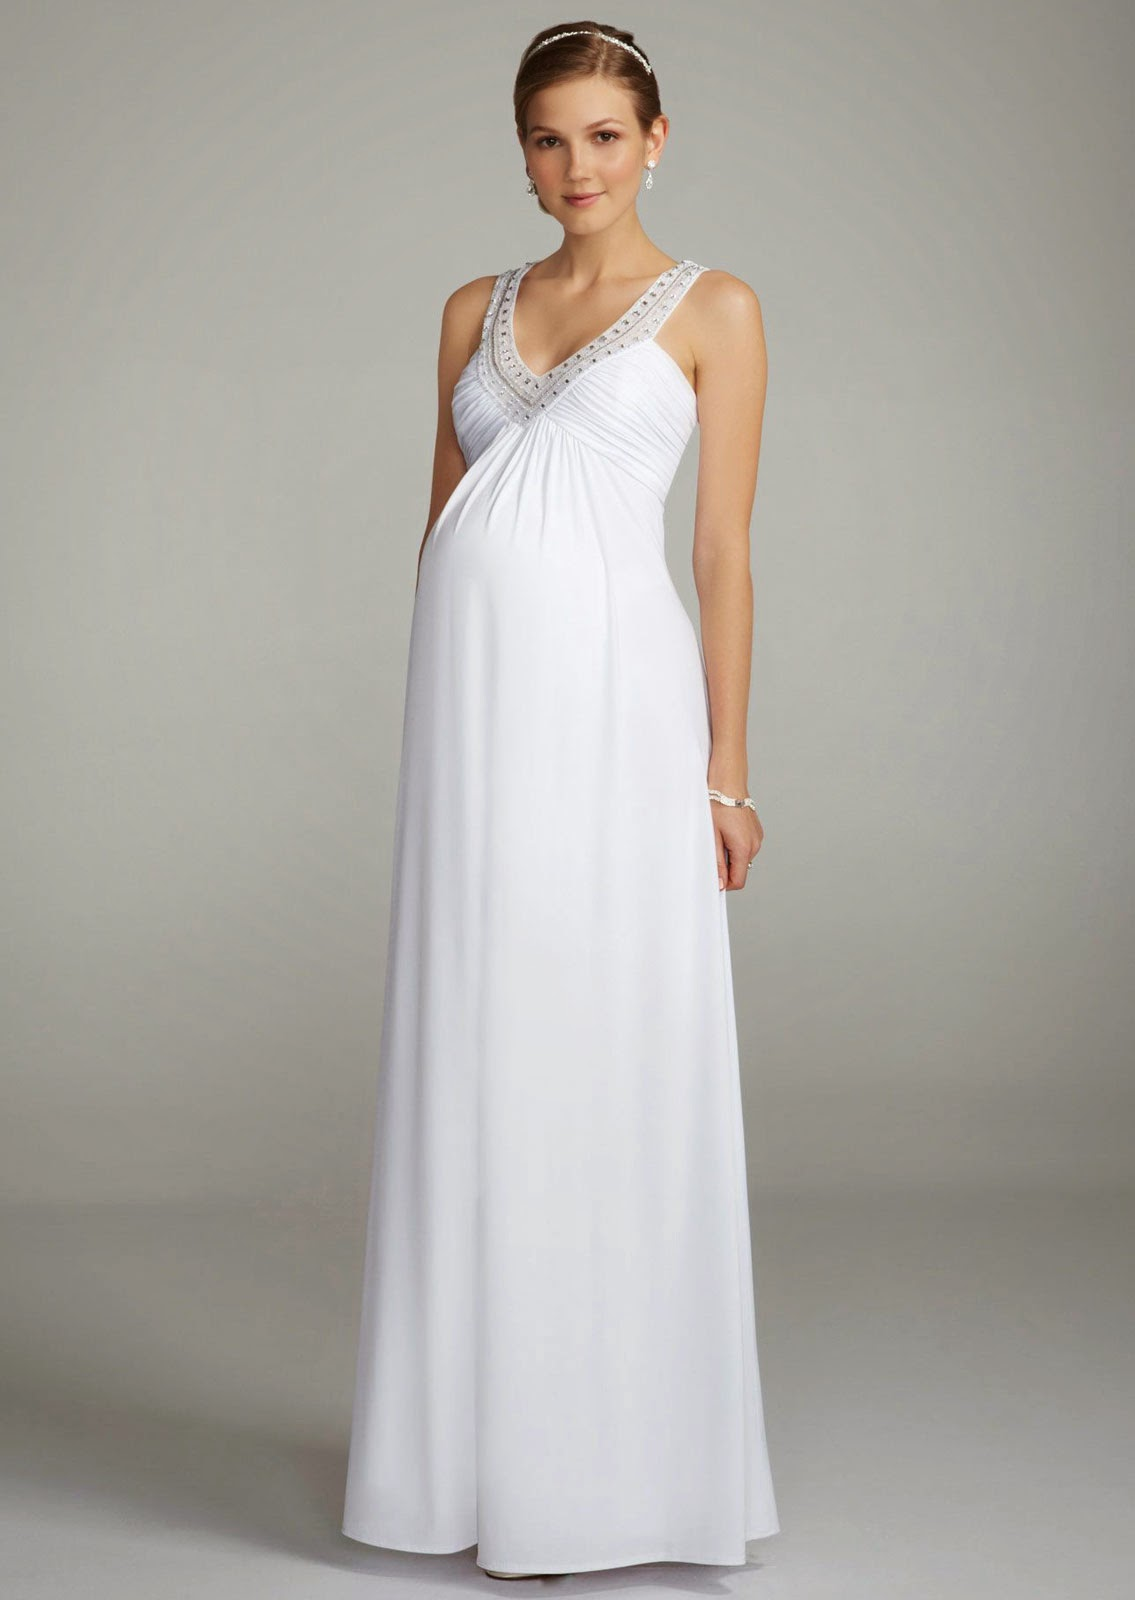 Cheap Affordable Maternity Wedding Dresses Ideas